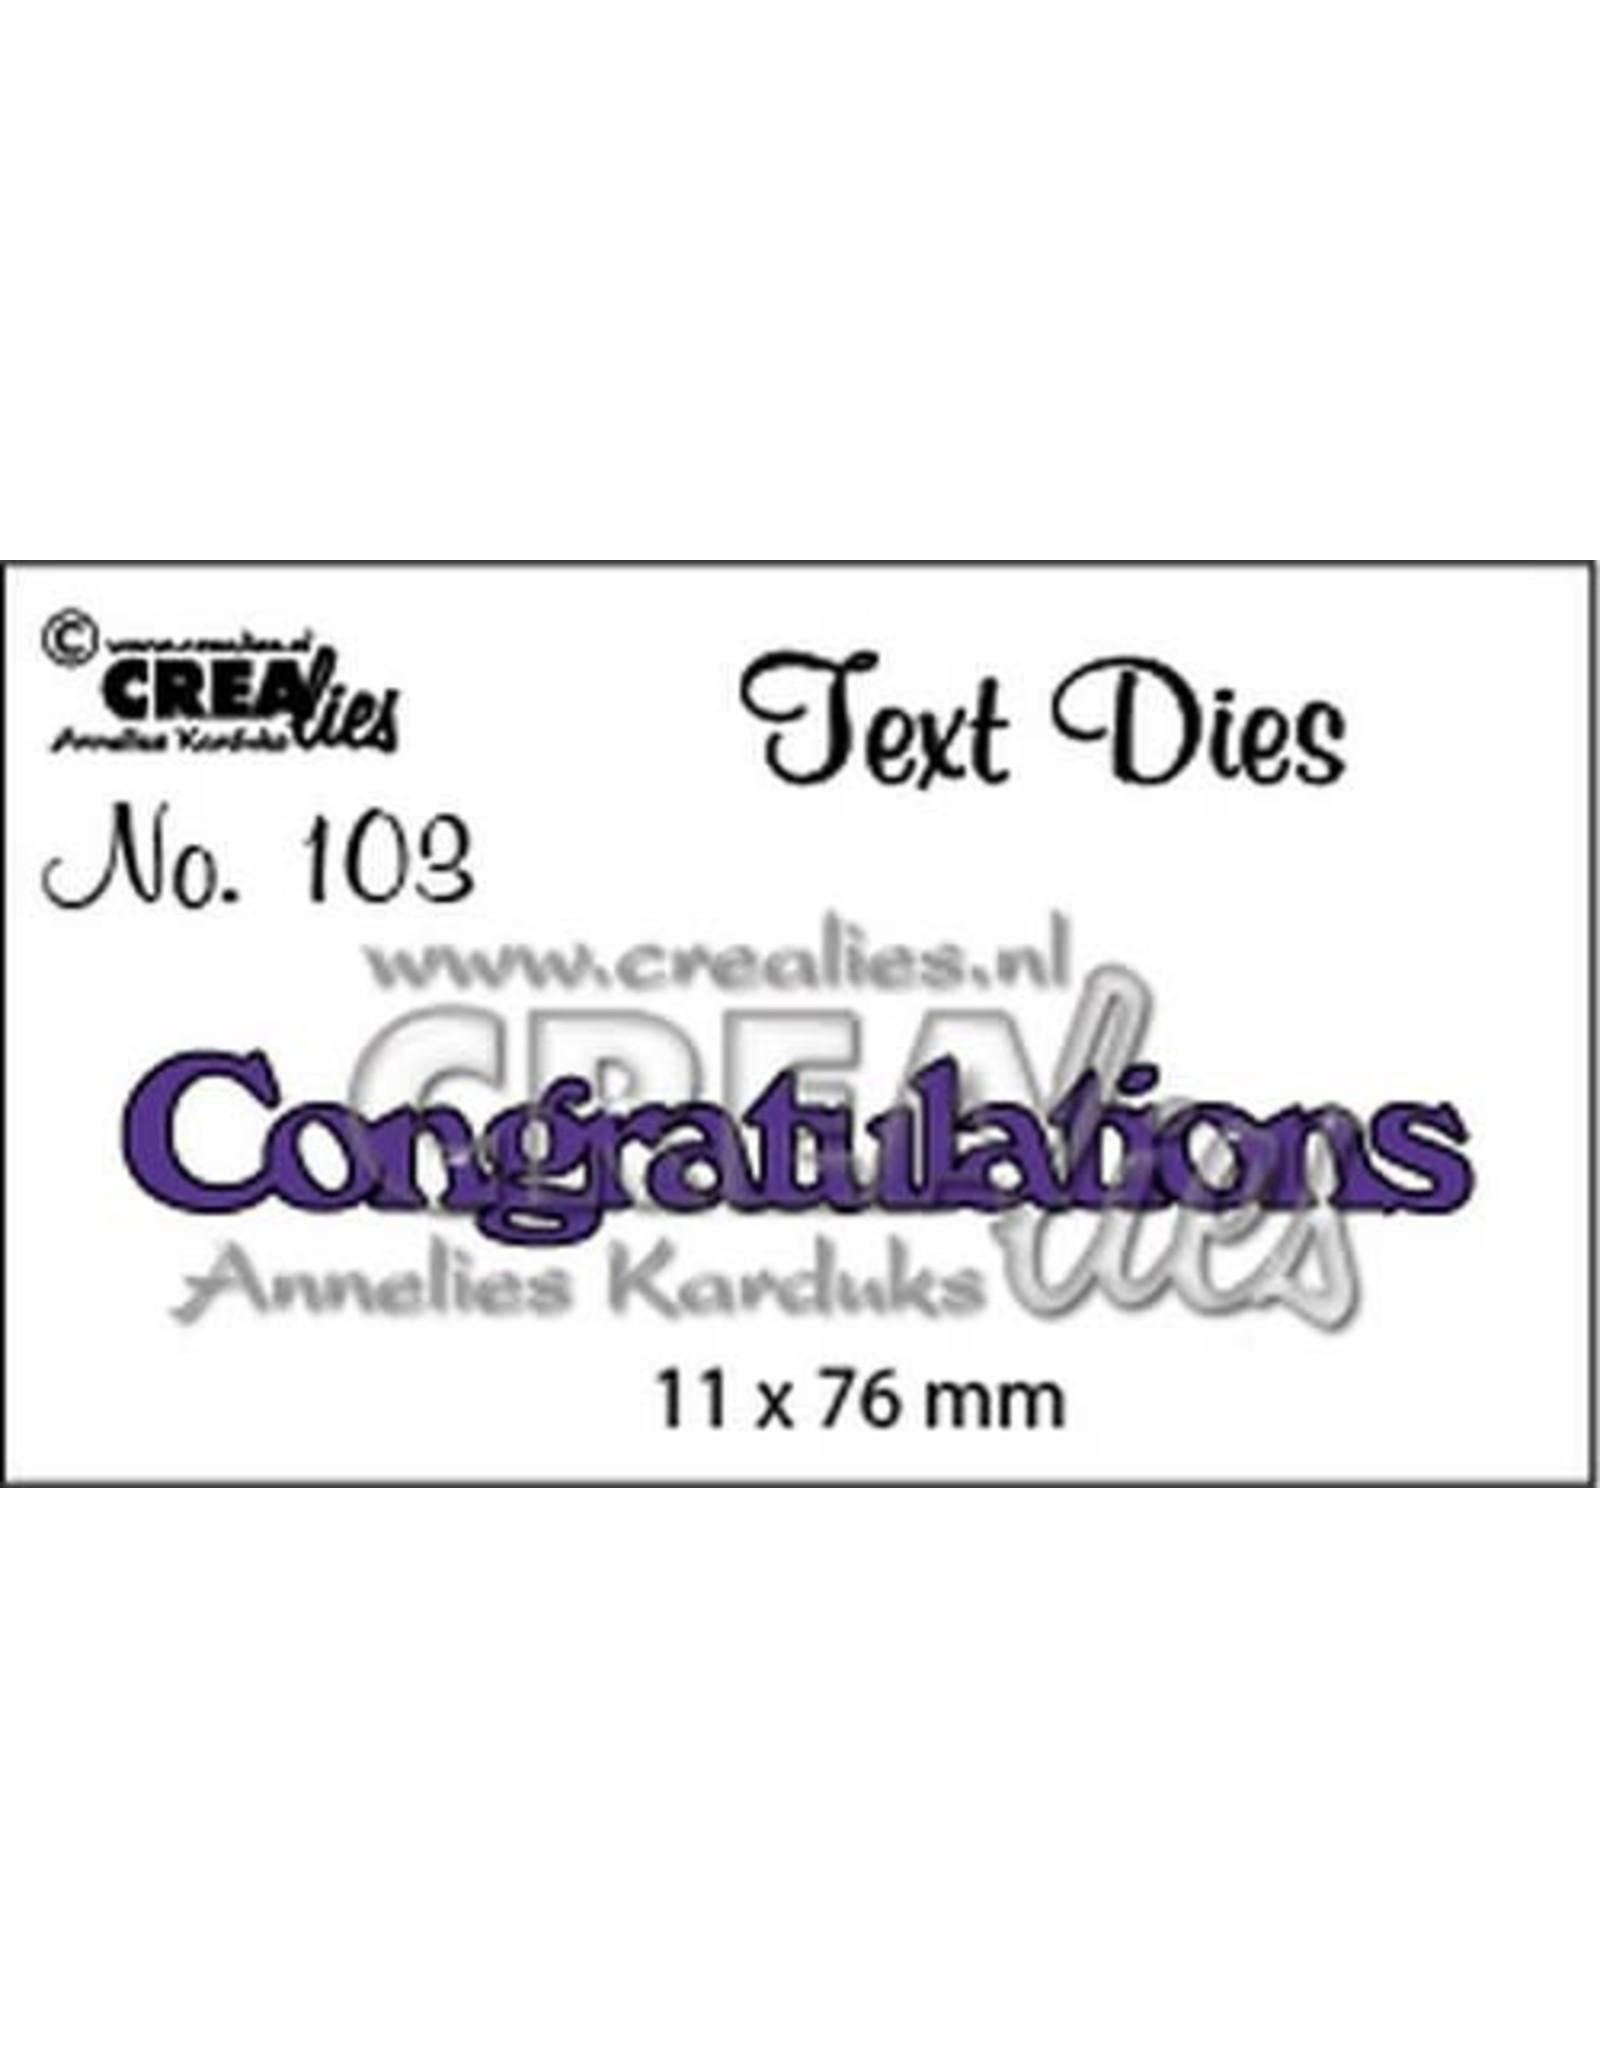 Crealies Crealies tekststans (Eng) Congratulations